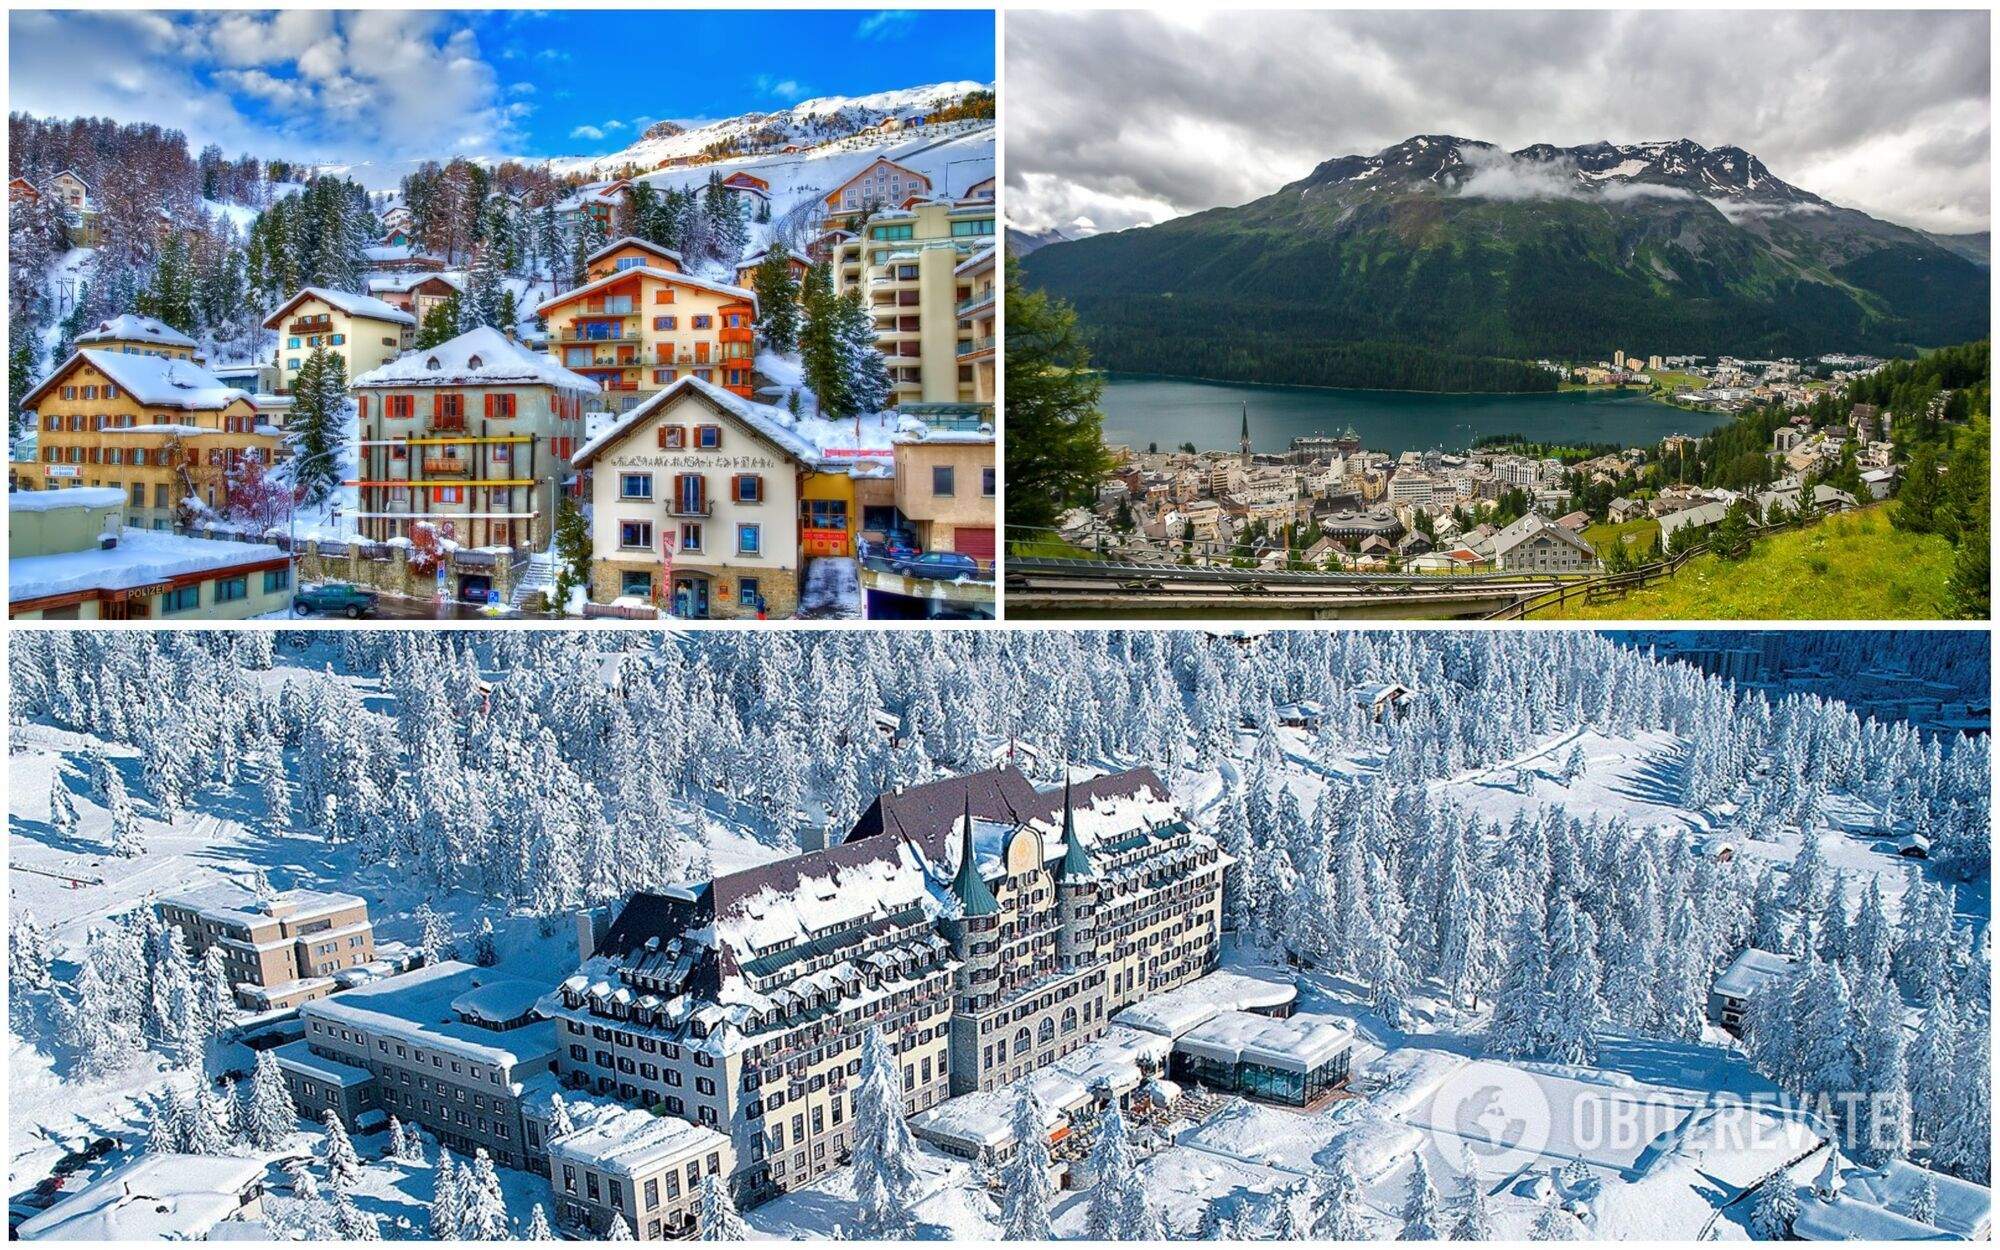 Швейцарский горнолыжный курорт Санкт-Мориц в Швейцарии